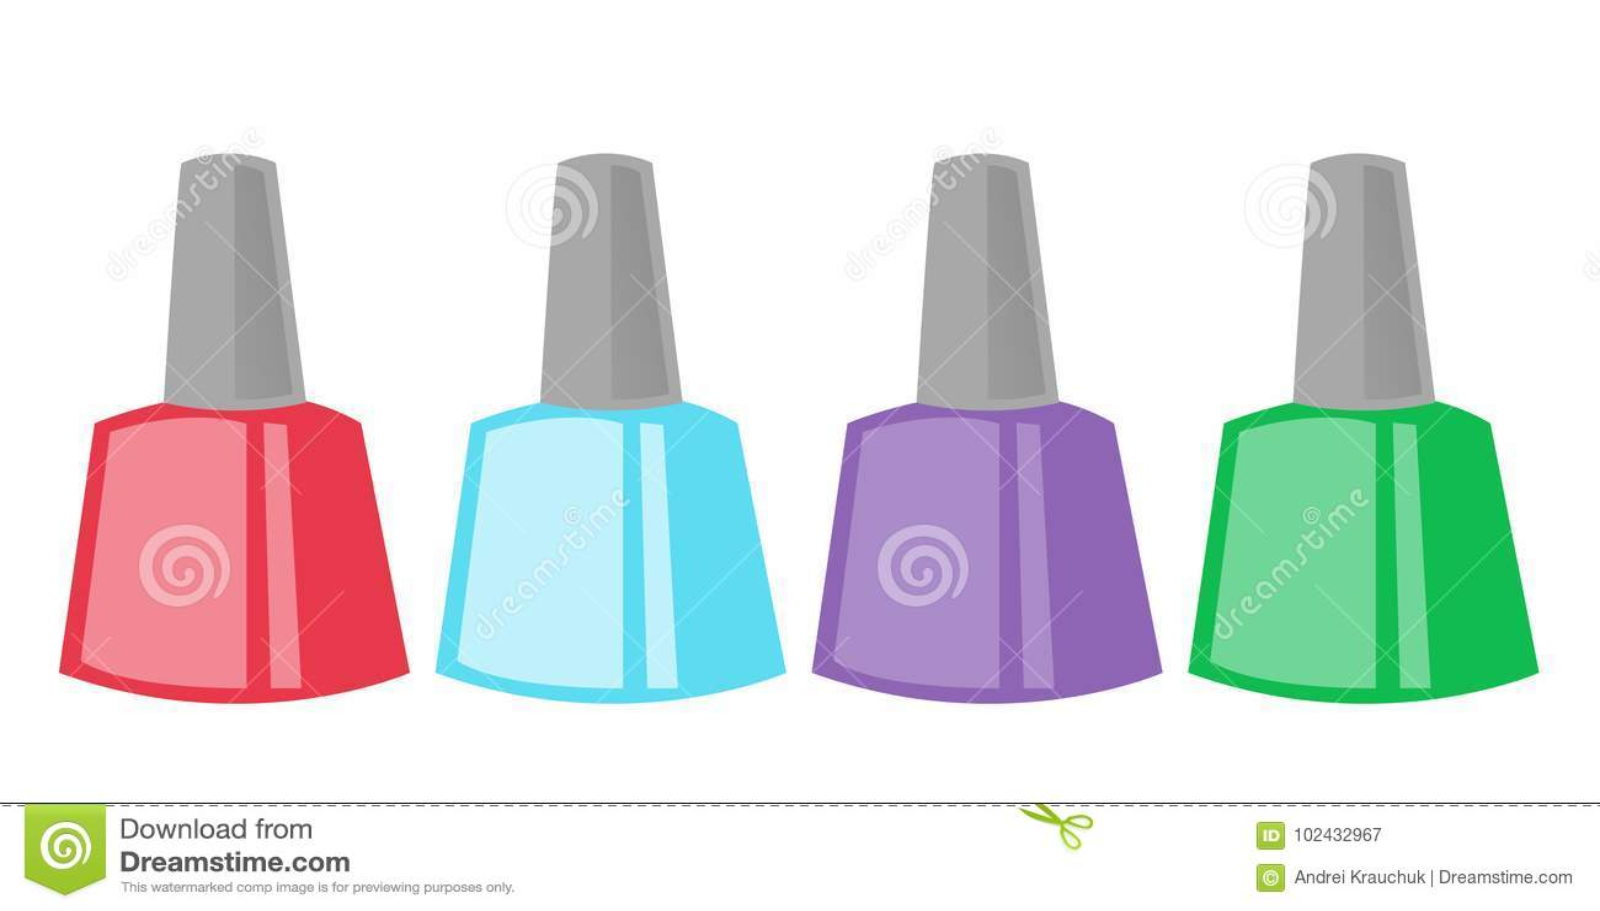 Nail Polish Bottles Vector Cartoon Illustration. Stock Vector ...